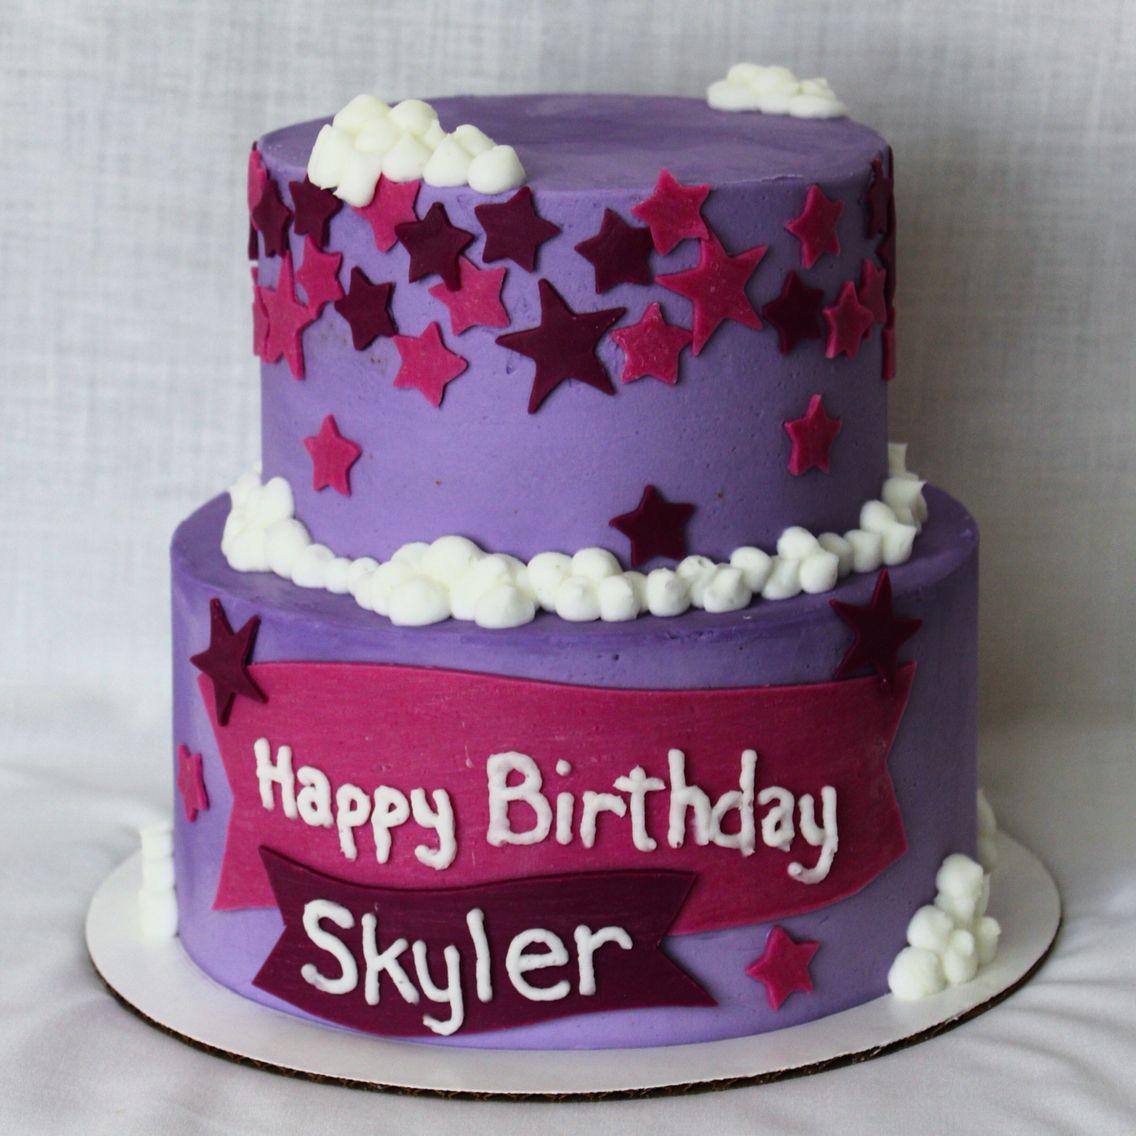 Twilight Sparkle Themed Birthday Cake Missing The Pony On